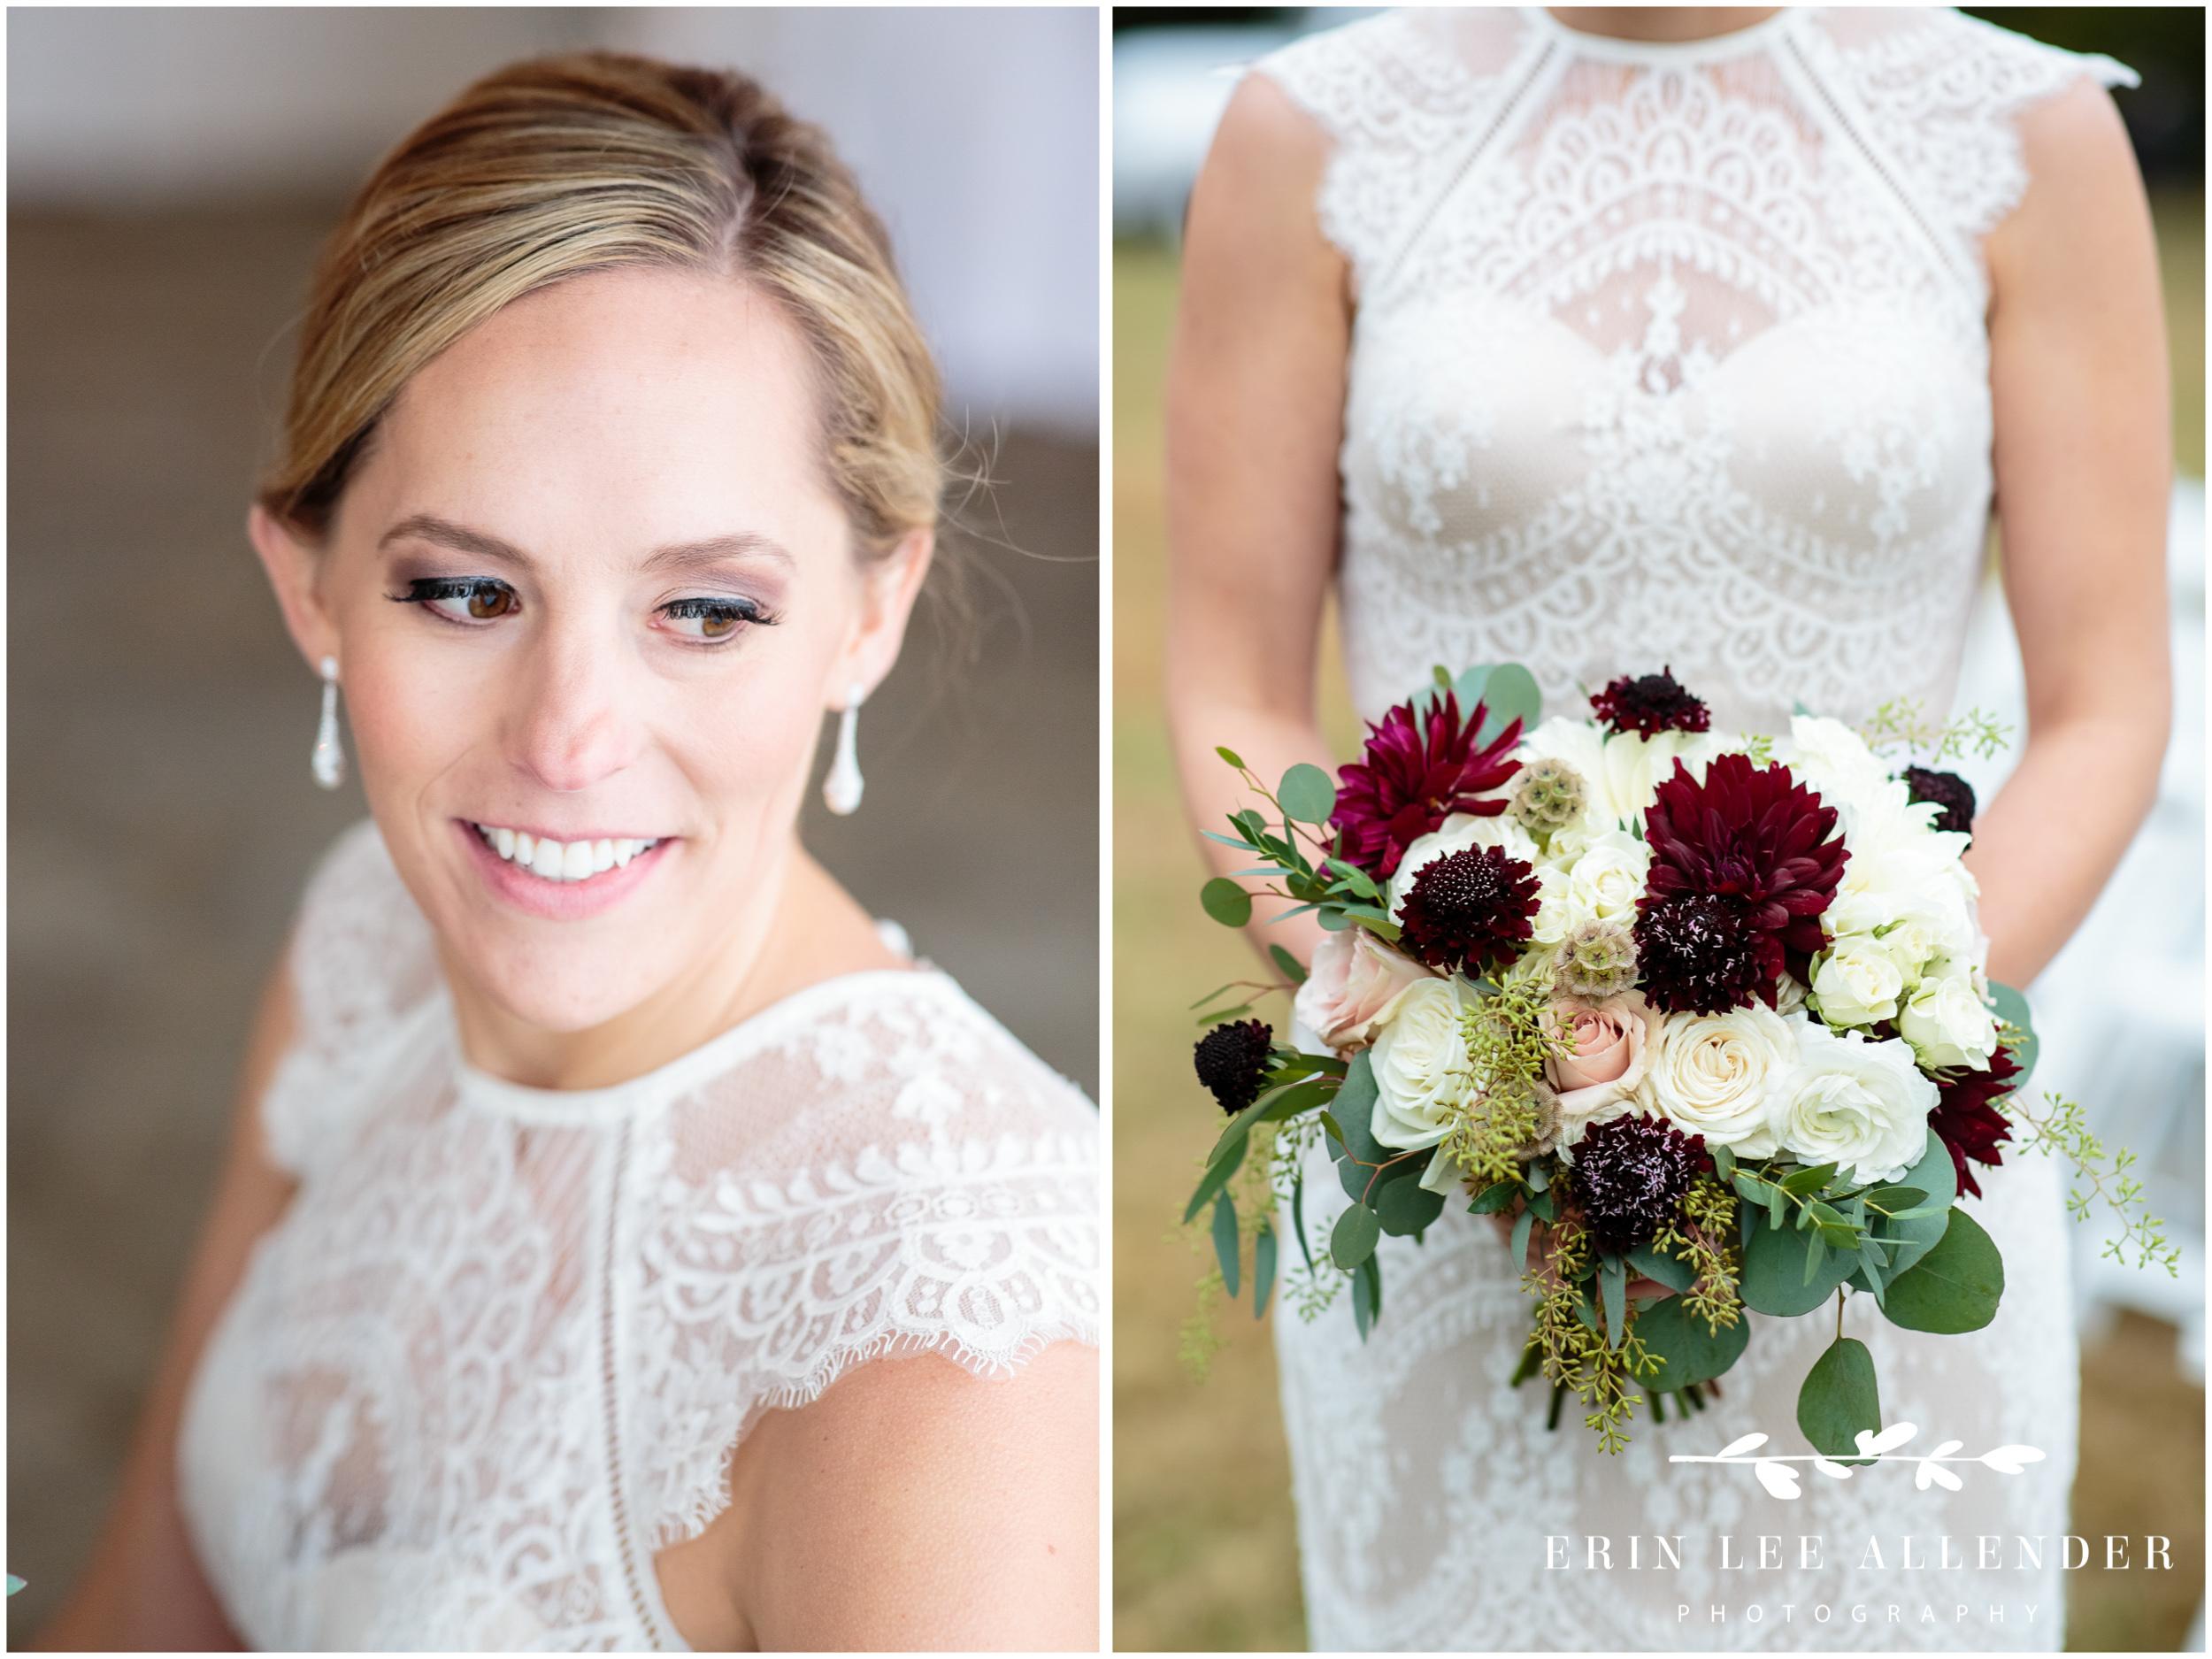 cap-sleeve-wedding-dress